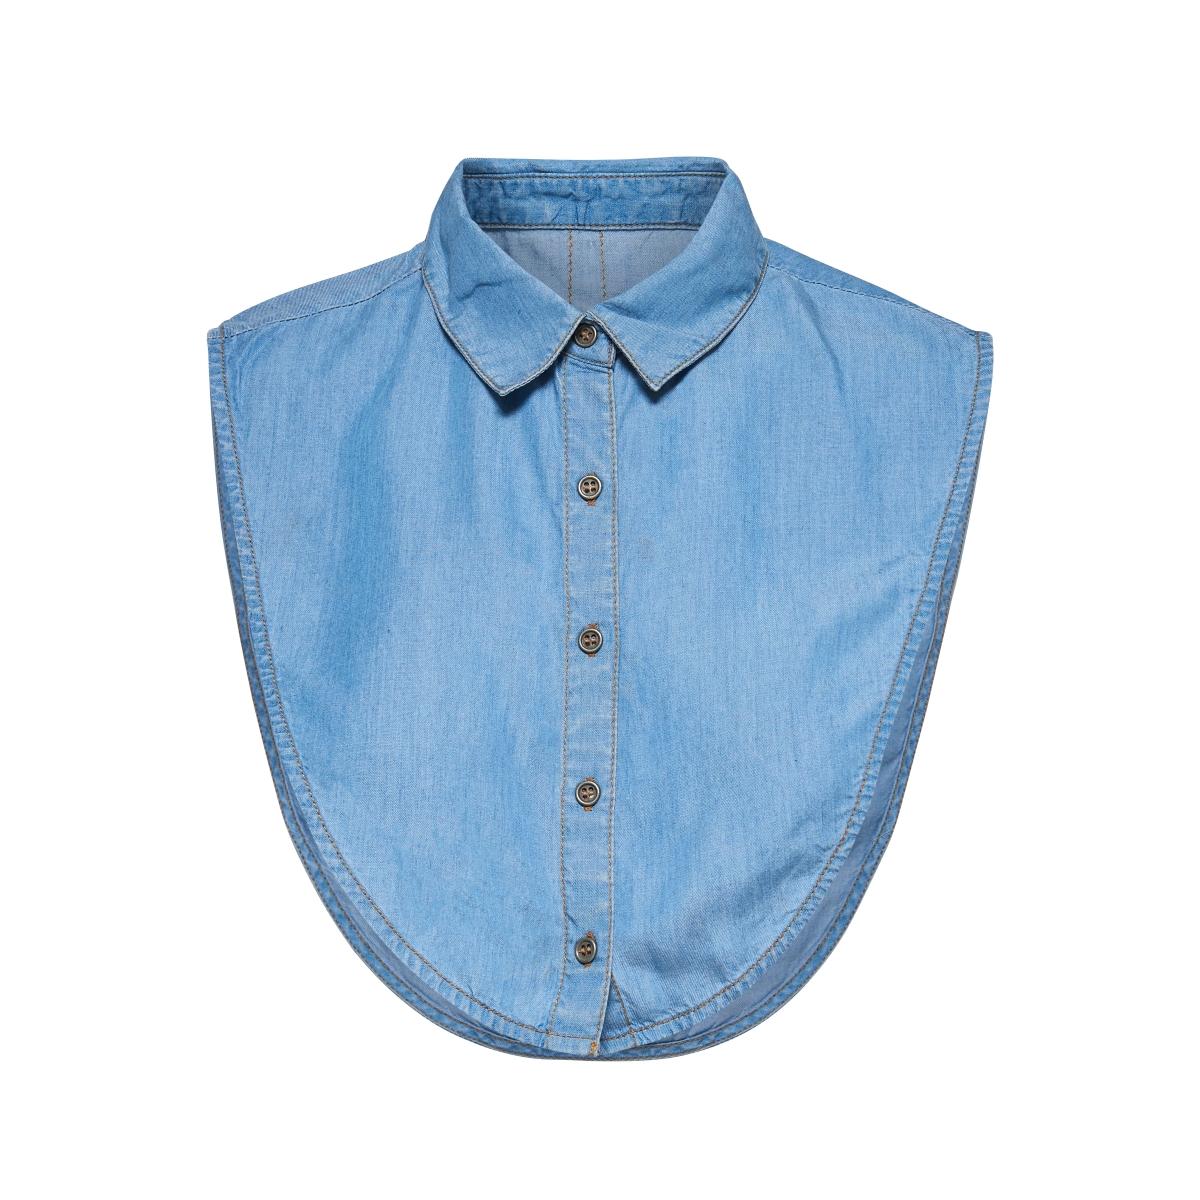 onlshelly cory denim collar acc 15142964 only accessoire light blue denim